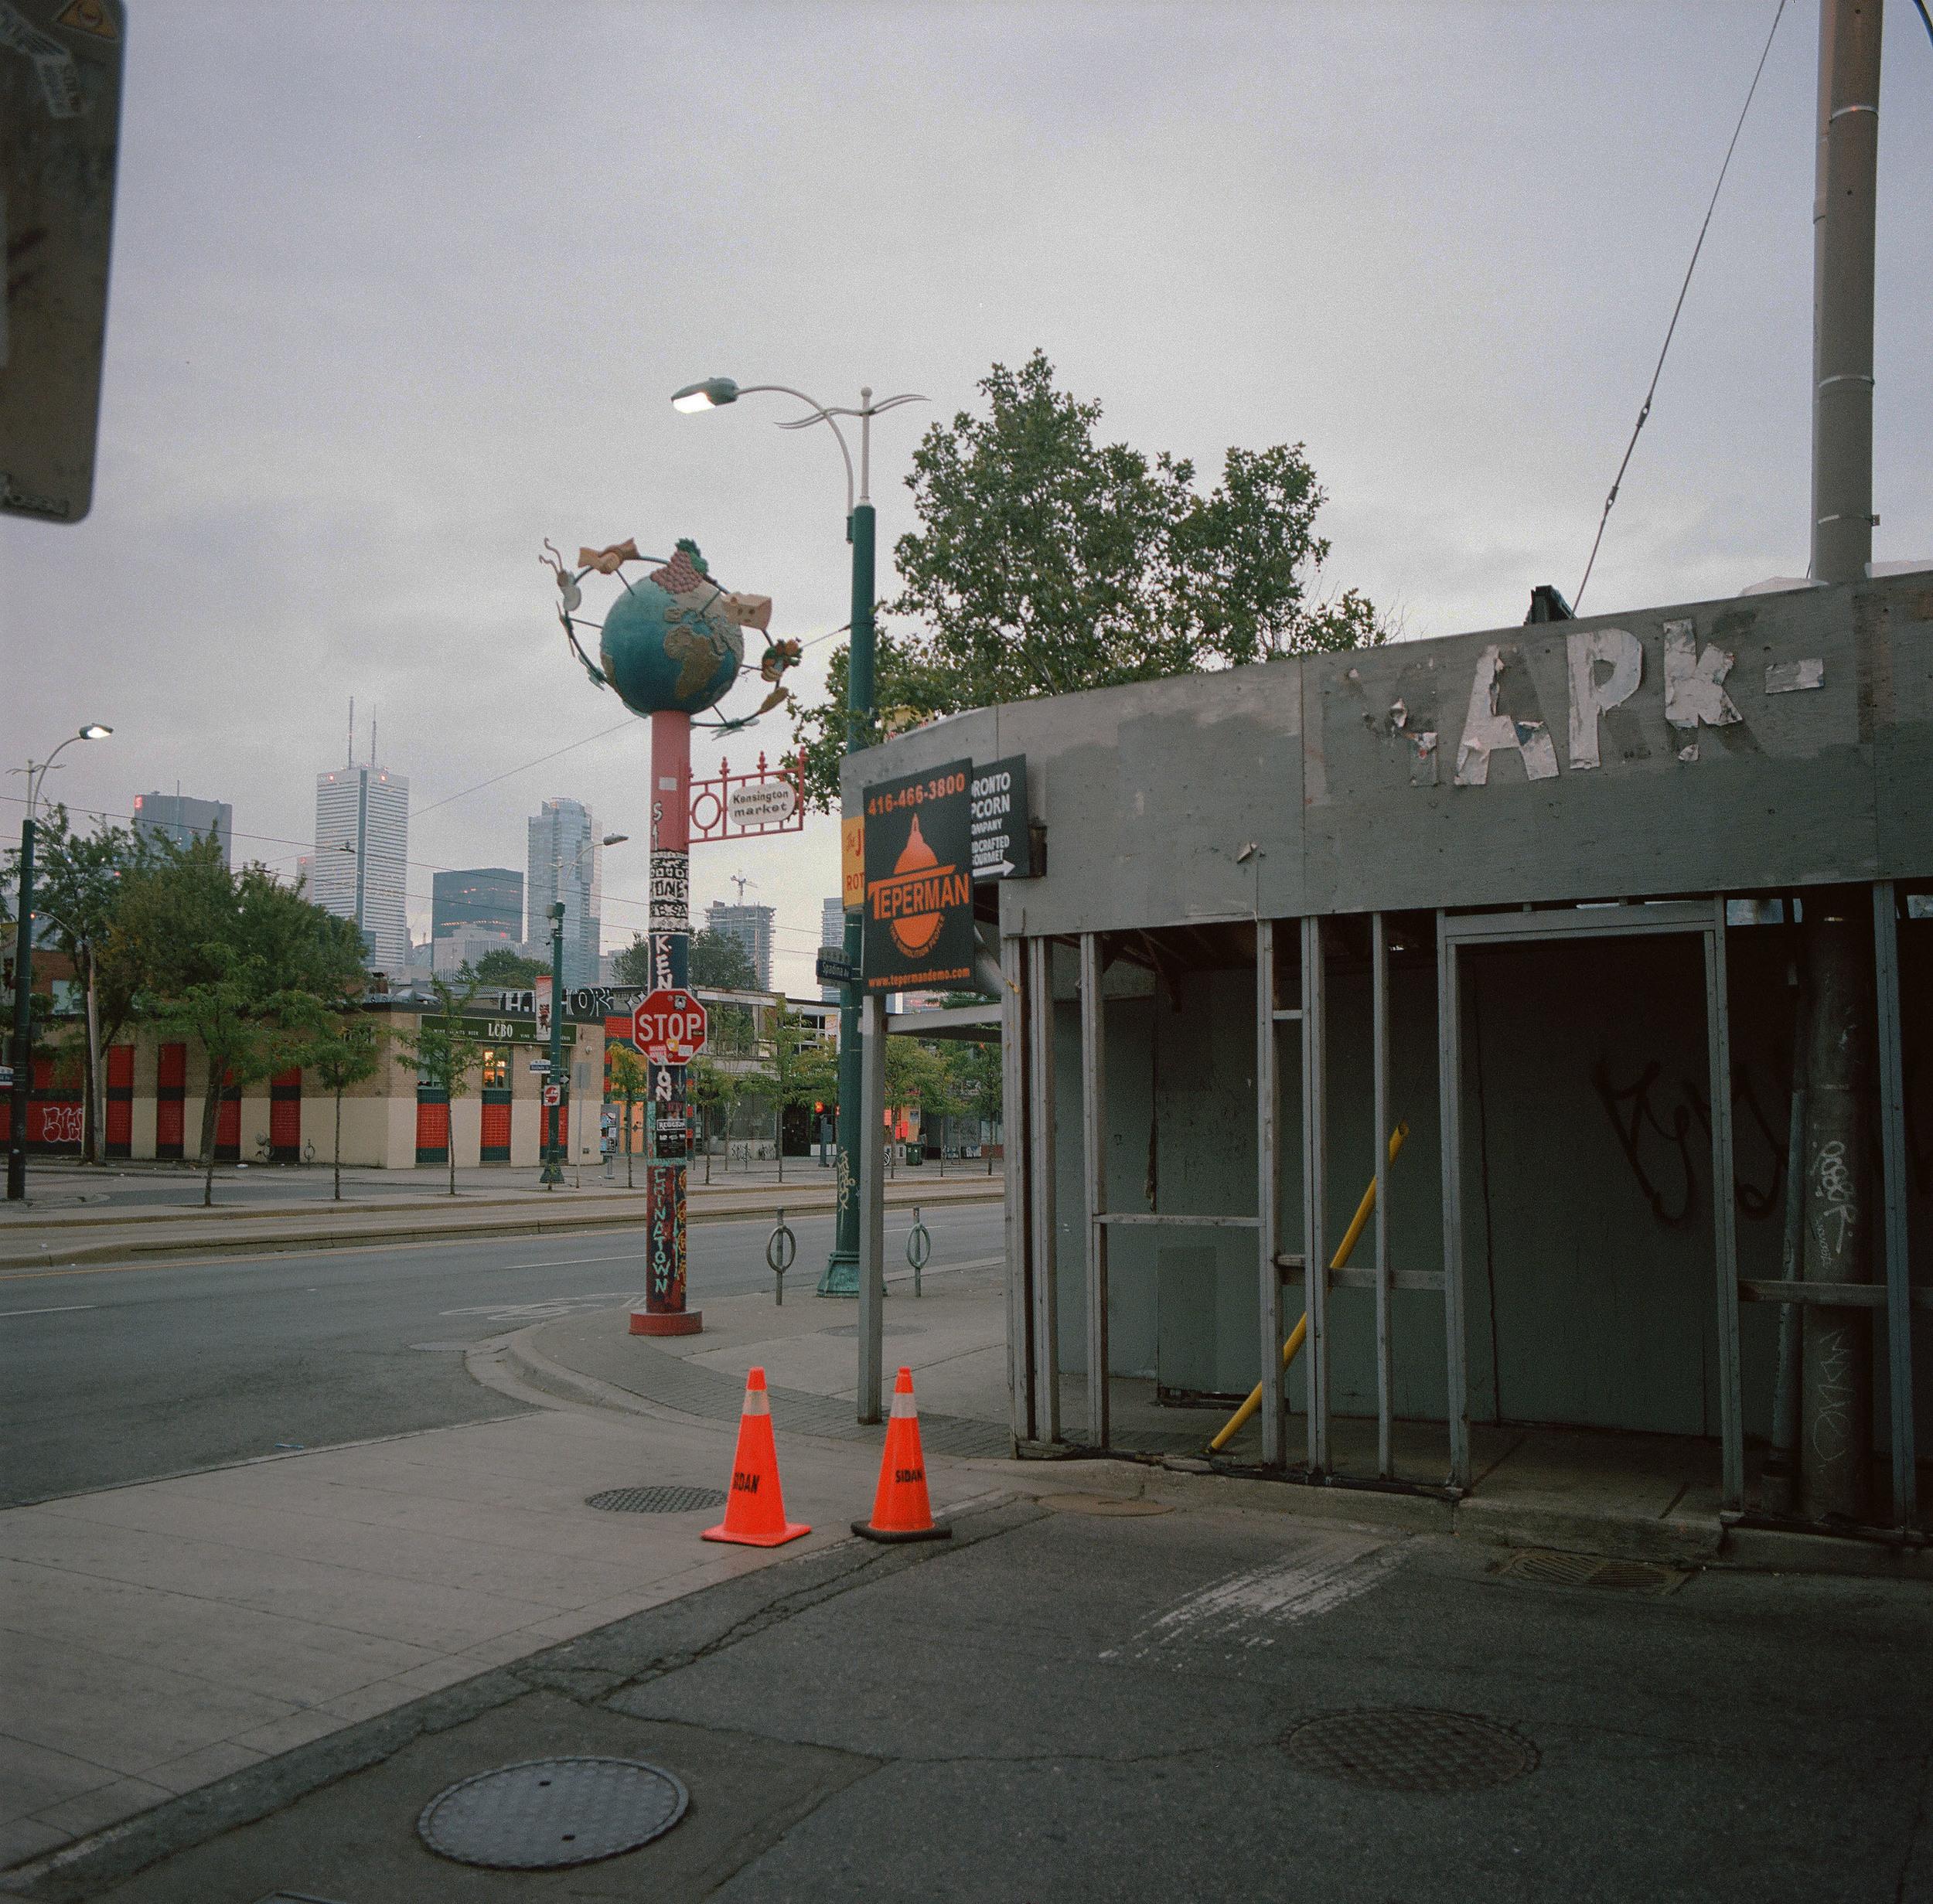 St. Andrew Street at Spadina Avenue, Toronto, Ontario, 2015